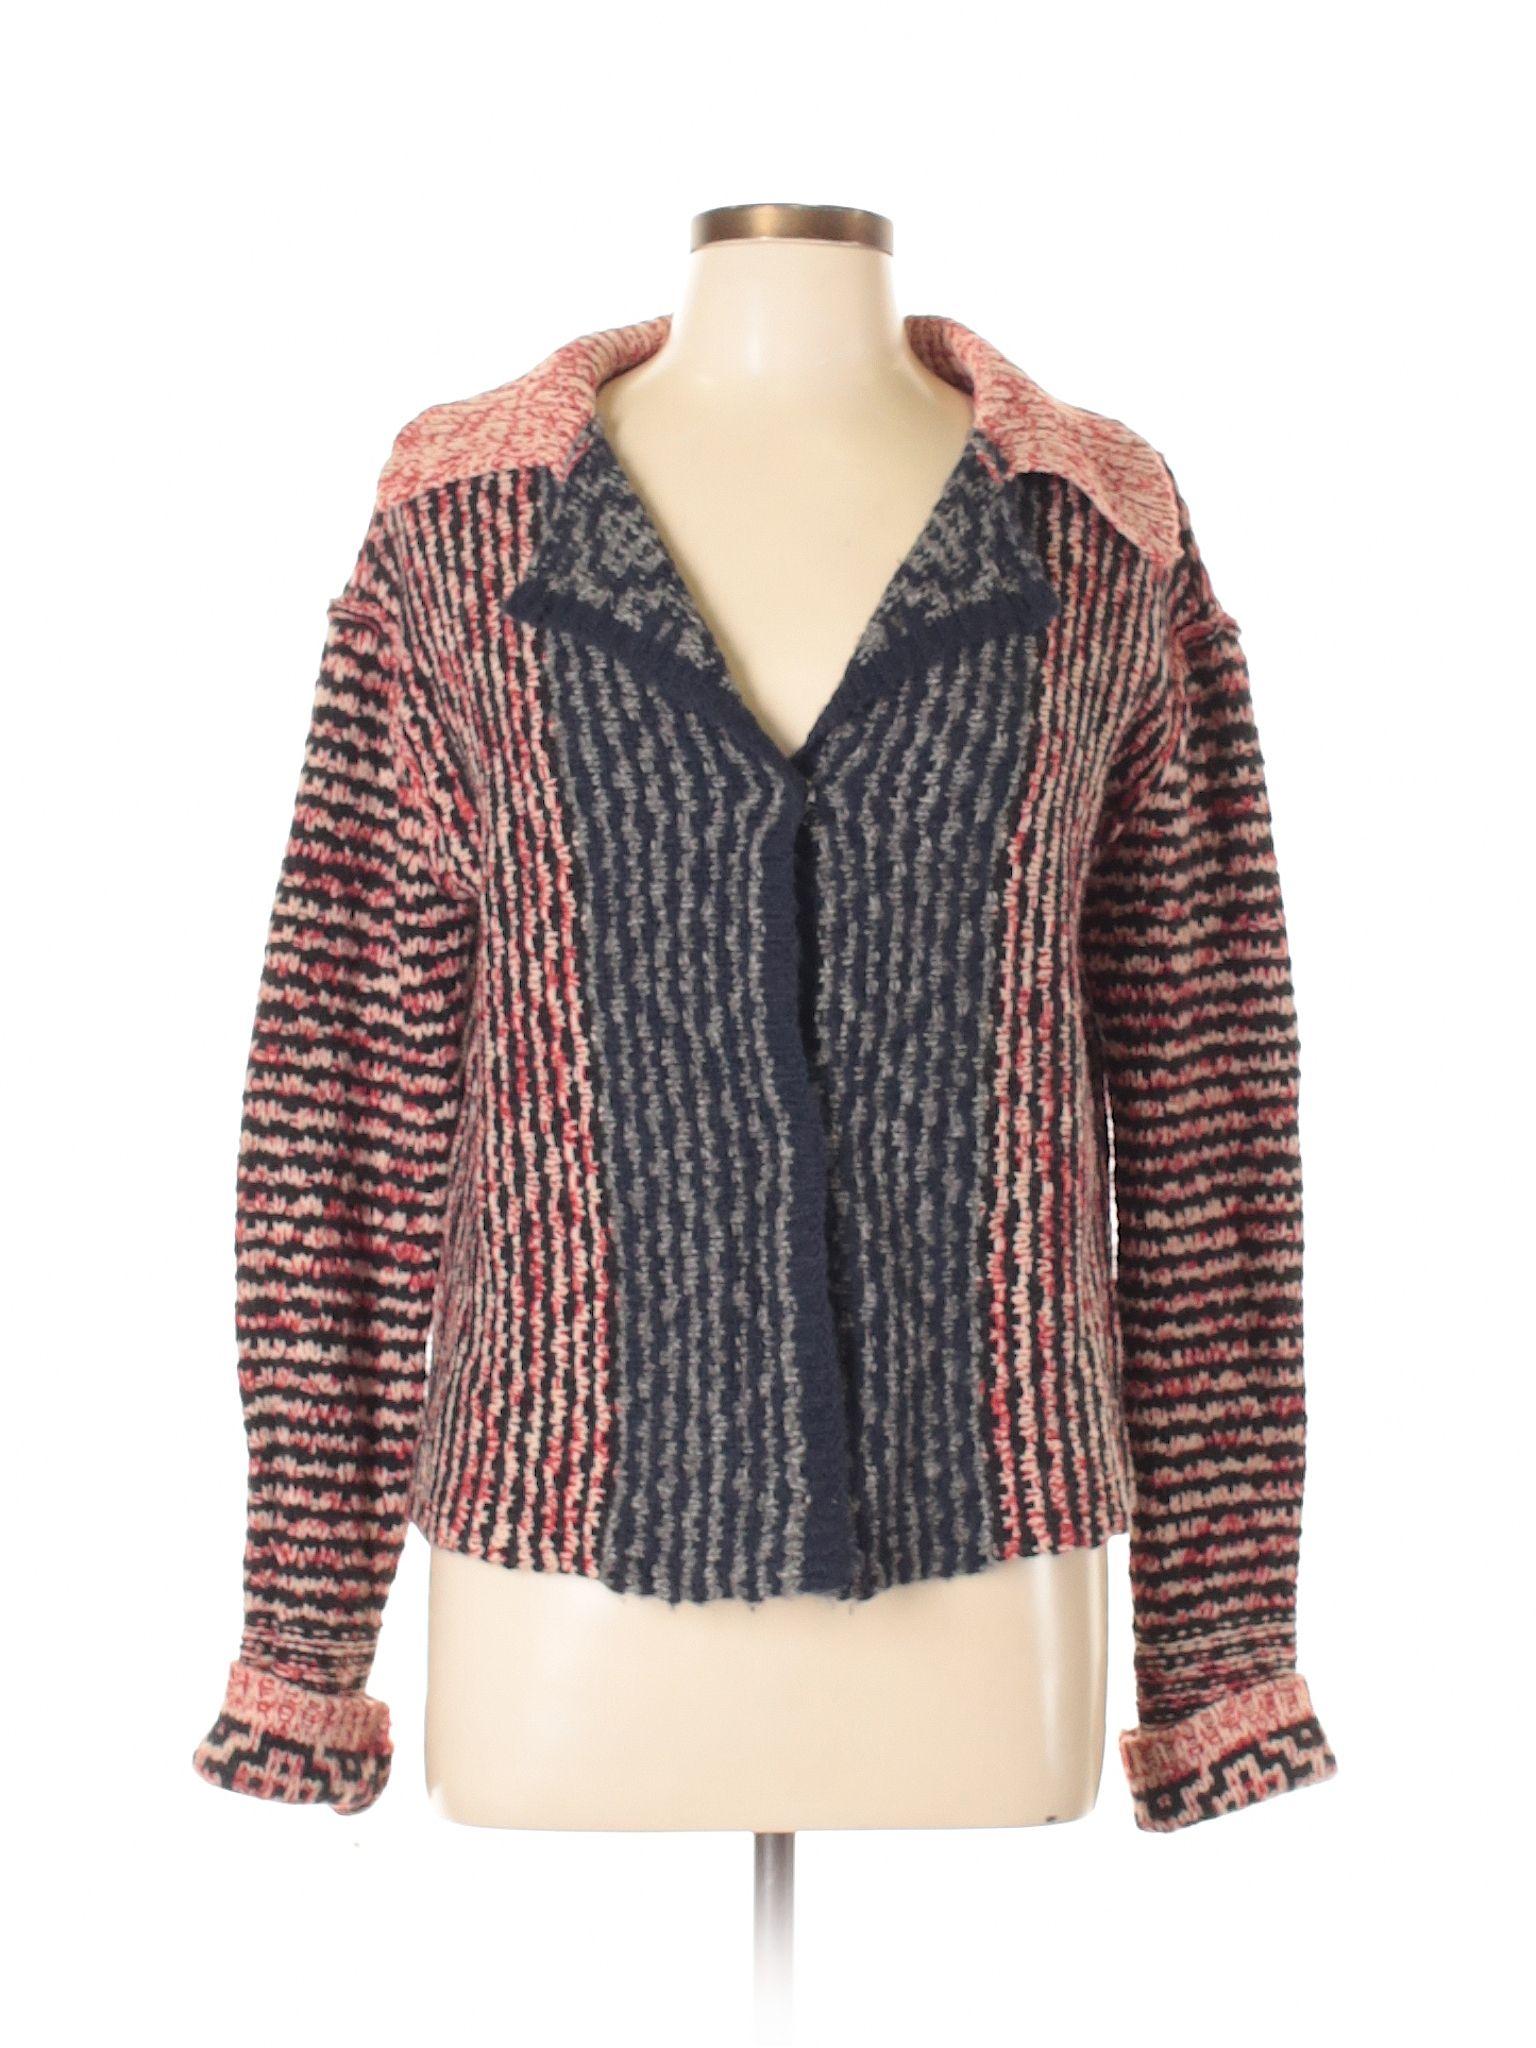 87ae03f5d156 Free People Wool Cardigan: Size 12.00 Navy Blue Women's Sweaters &  Sweatshirts - $38.99